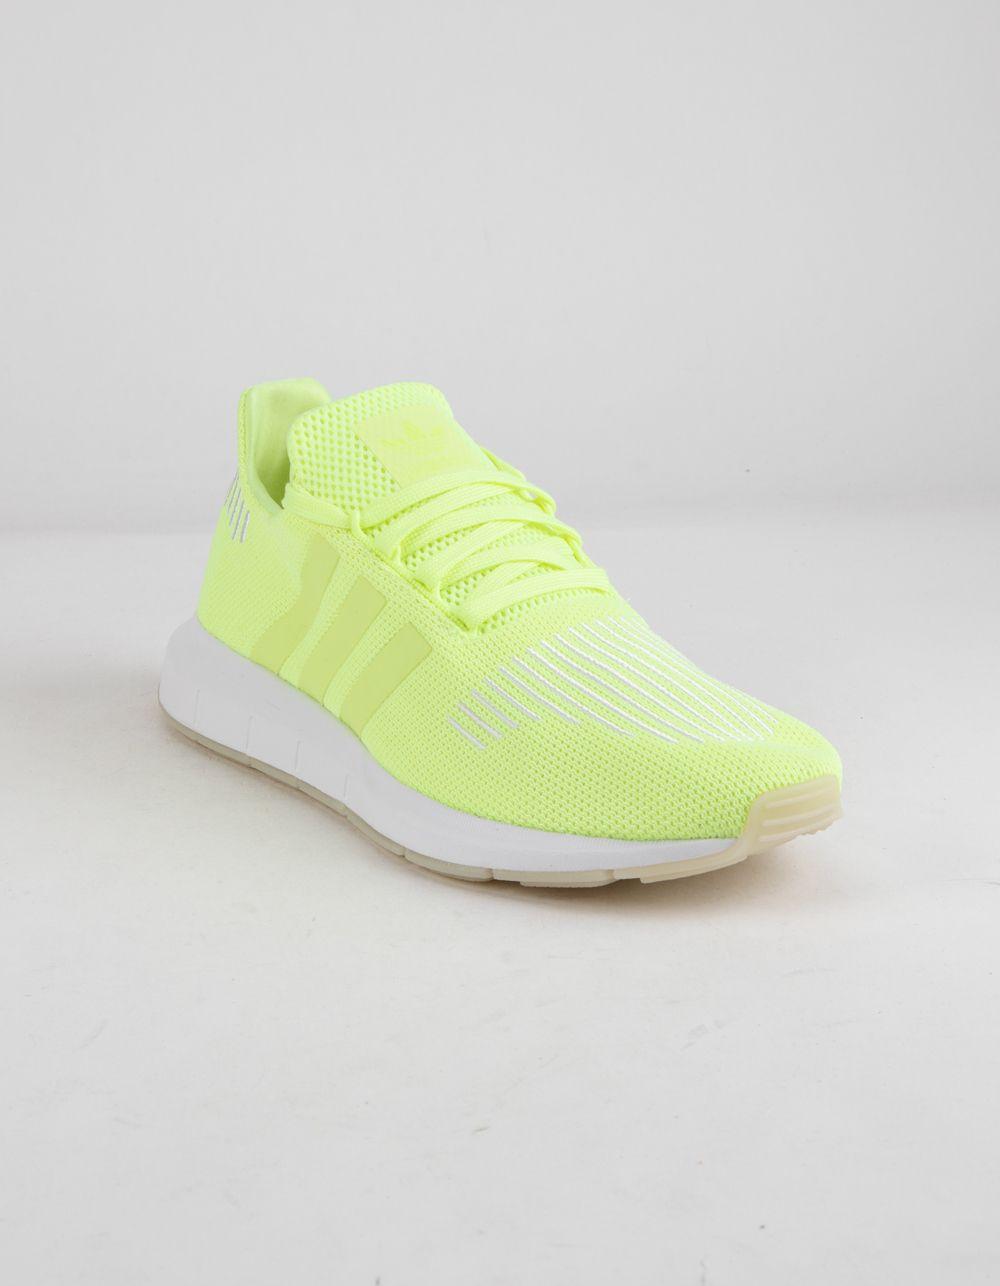 ADIDAS Swift Run Hi-Res Yellow Shoes - YELLO - 343911600   Yellow ...